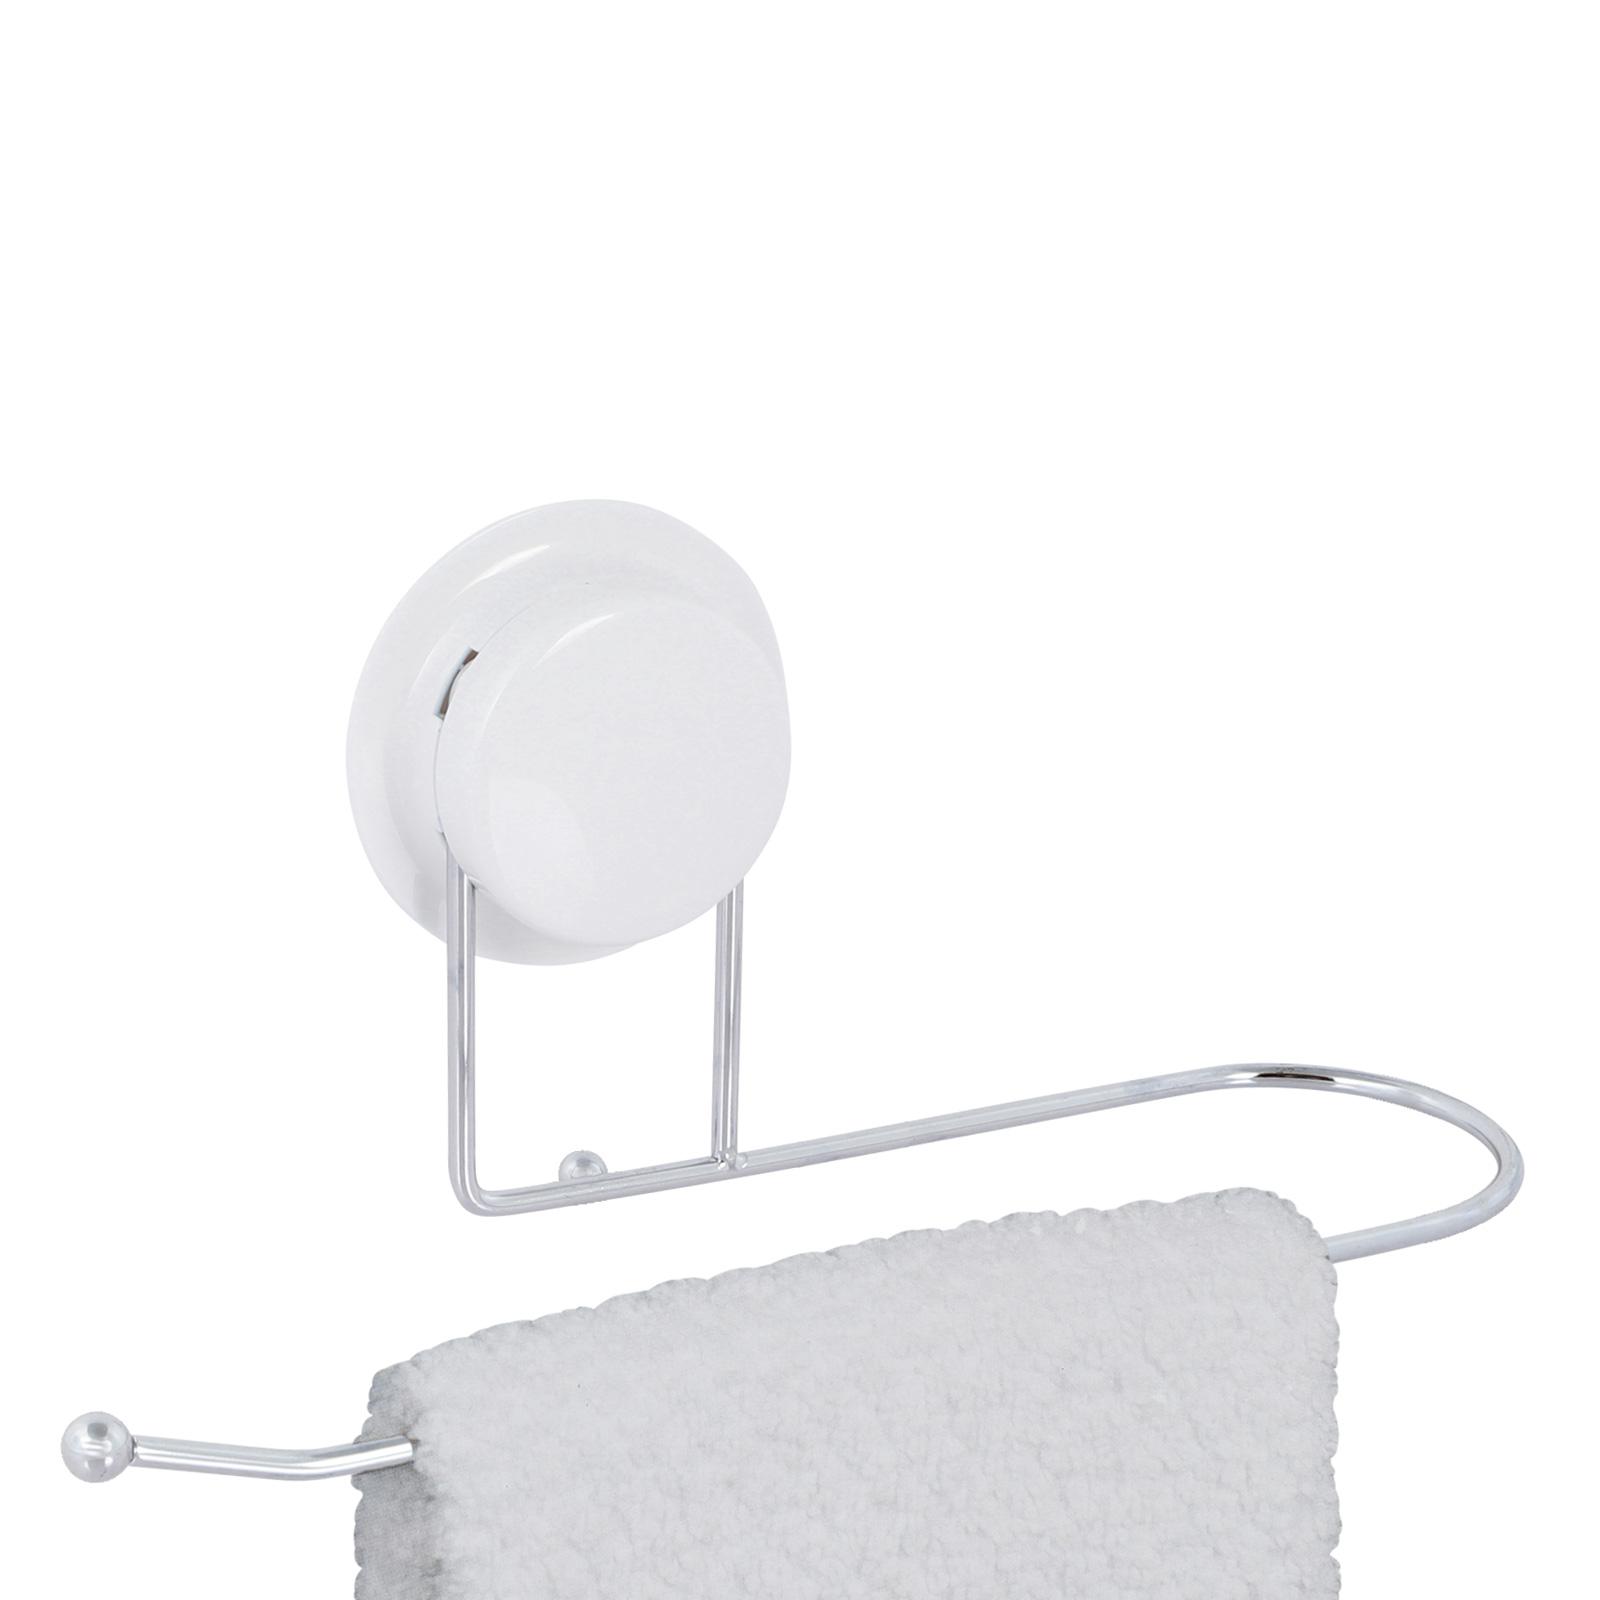 alpina® Handtuchstange ohne bohren Edelstahl Inox 25cm 5Kg belastbar